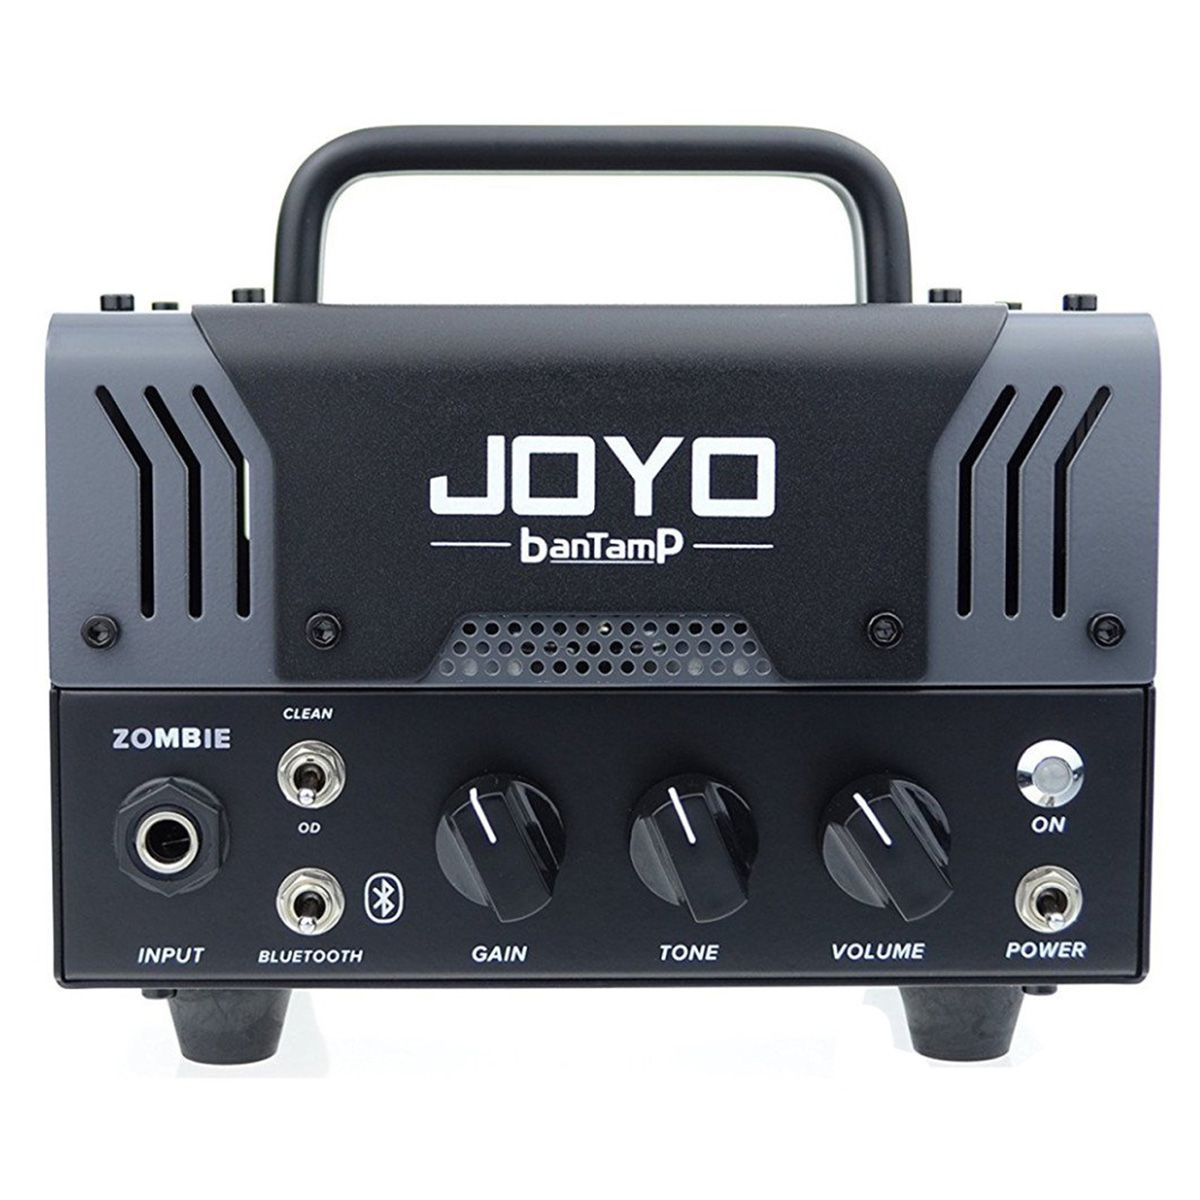 Mini Amplificador JOYO ZOMBIE BantamP 20W para Guitarra